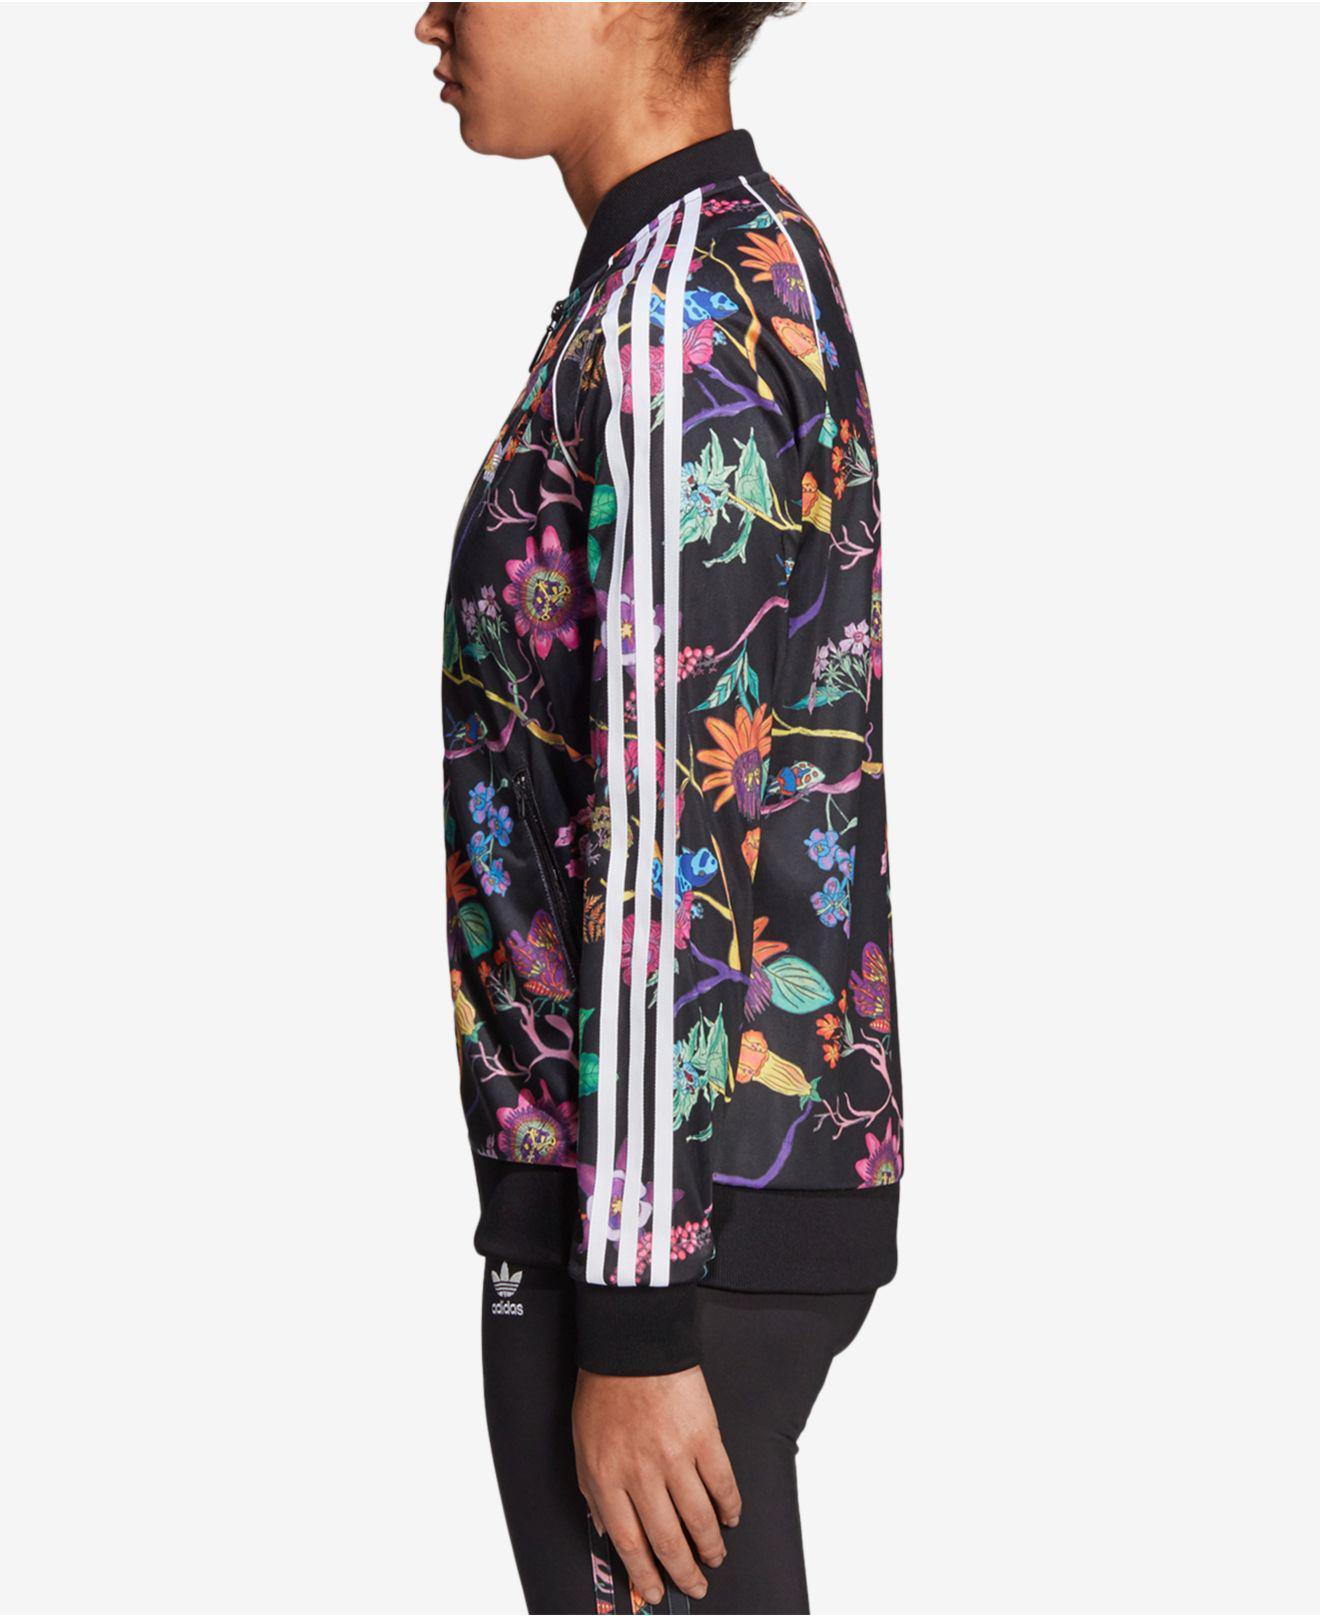 dd6eb1a41d3 adidas Originals Garden Print Track Jacket in Black - Lyst